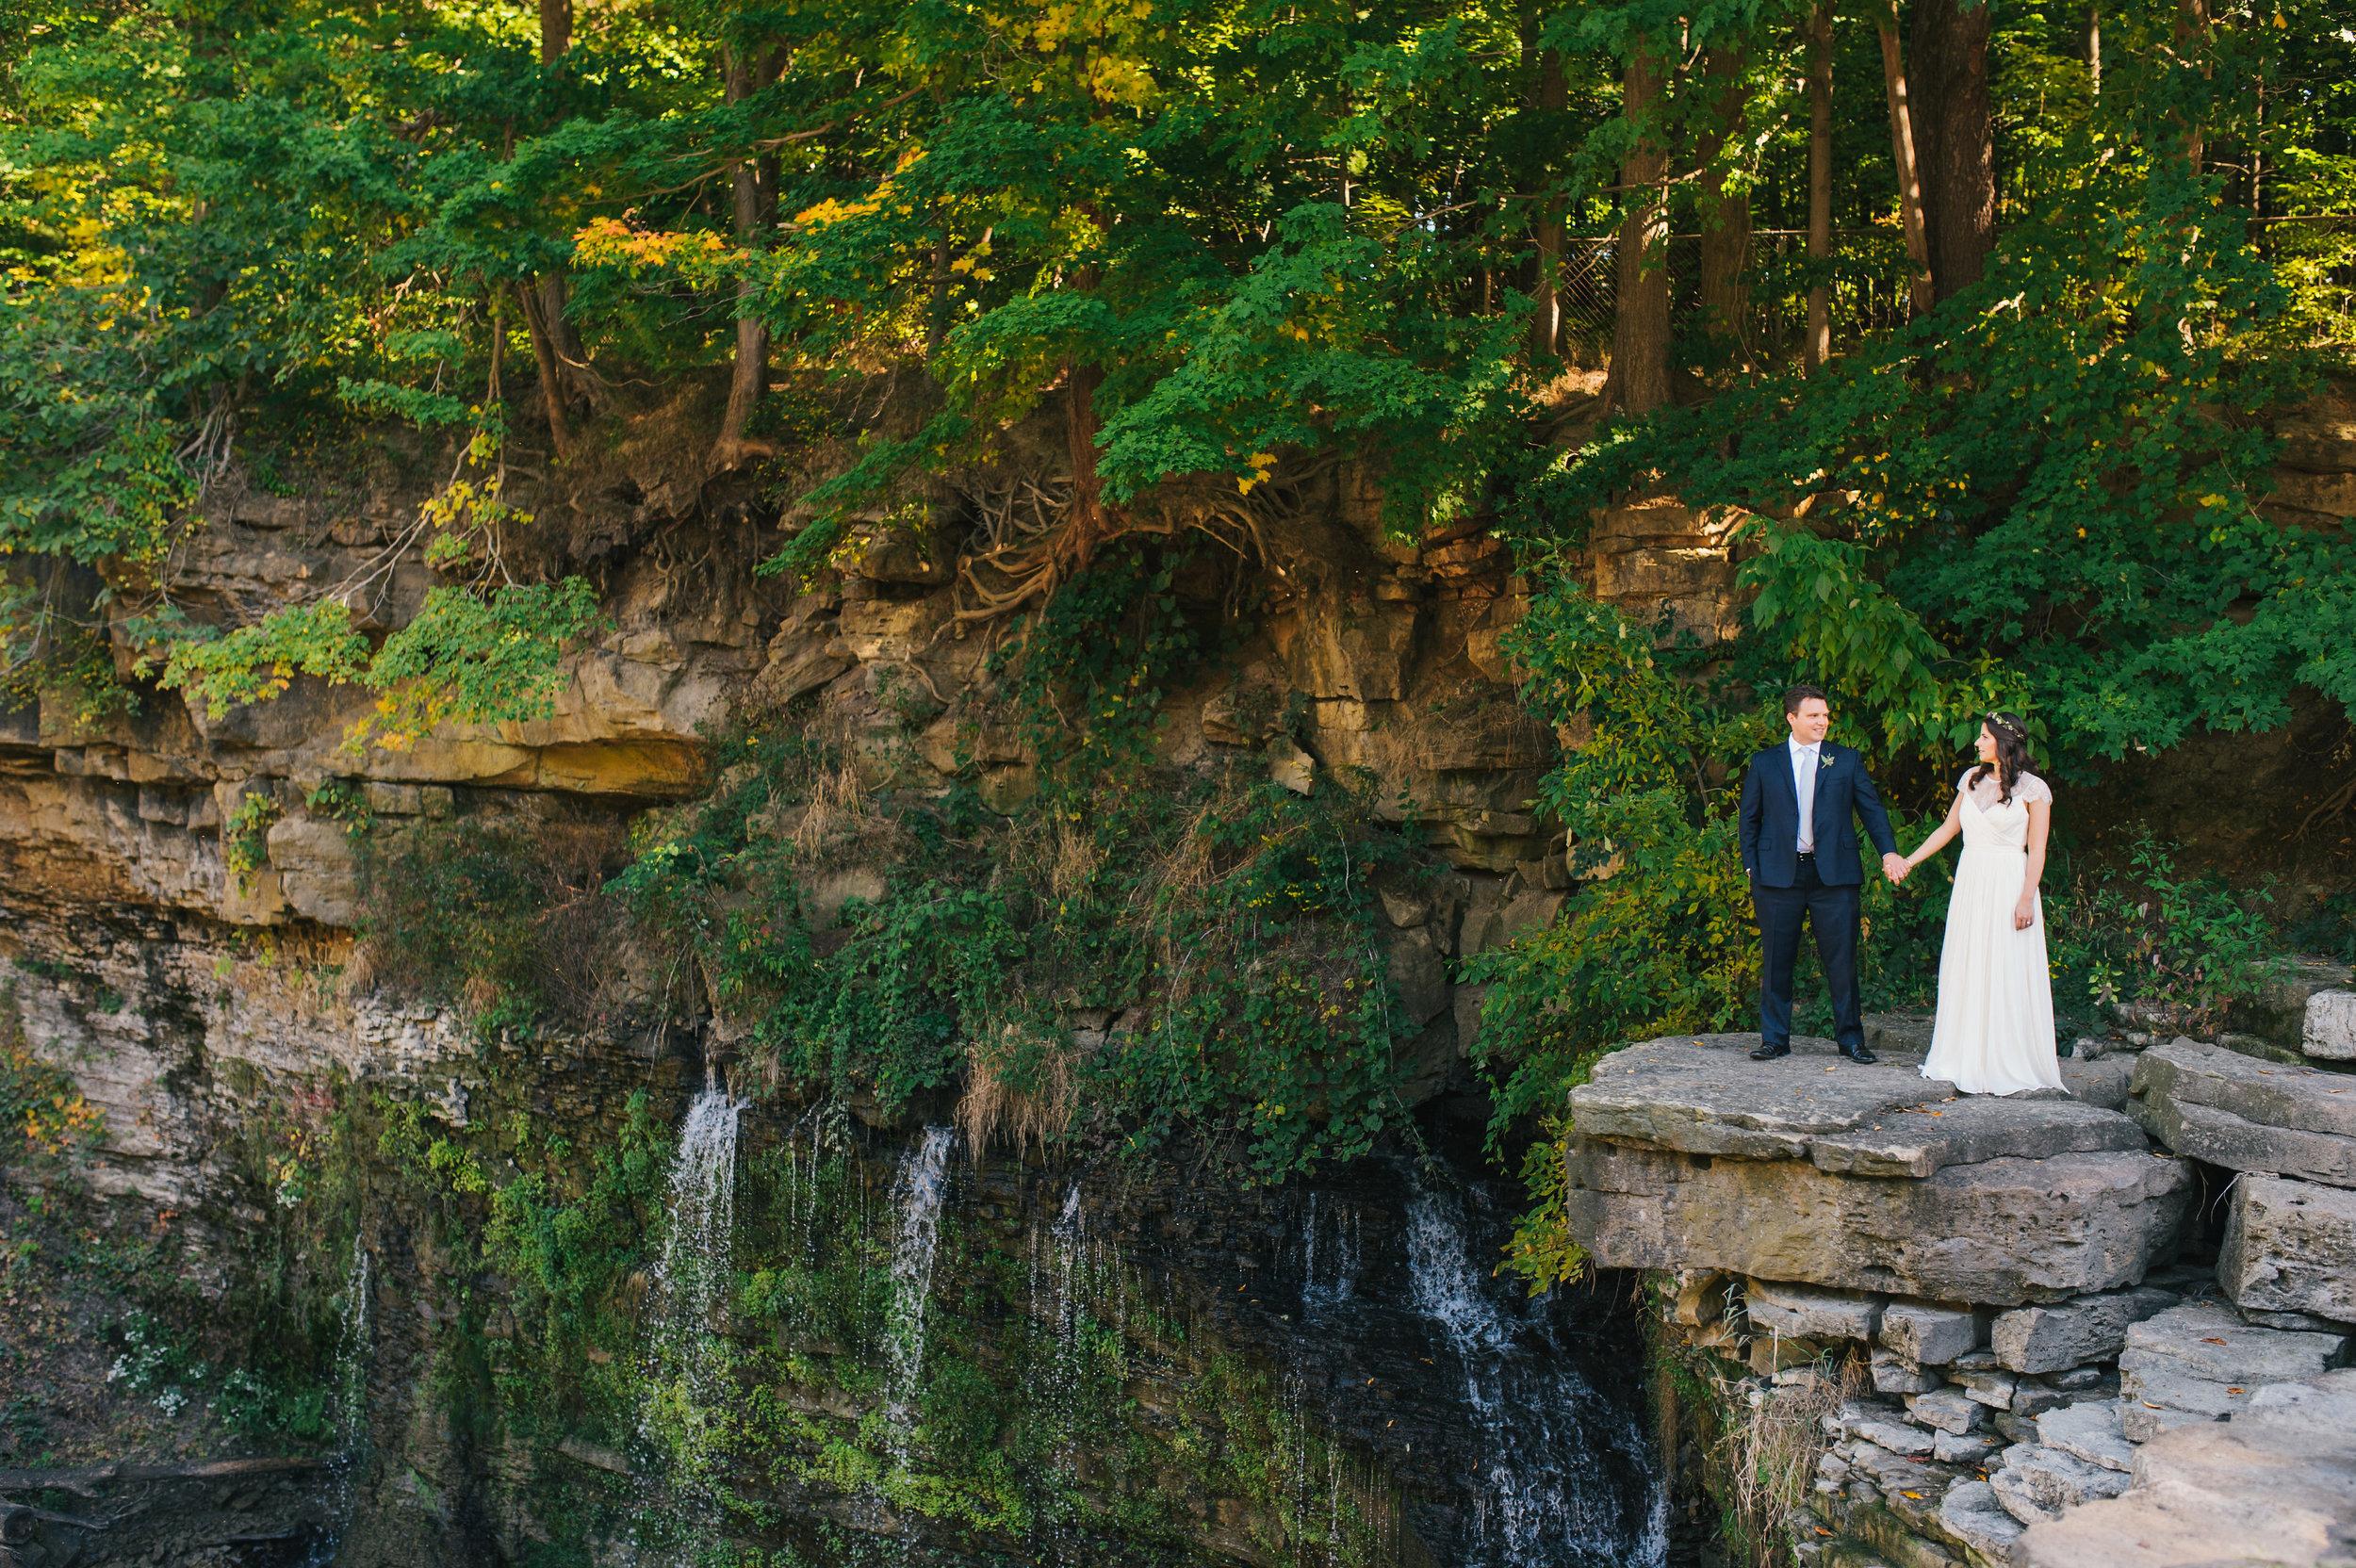 marial-daniel-wedding-balls-falls-sara-wilde-photography-0323.jpg